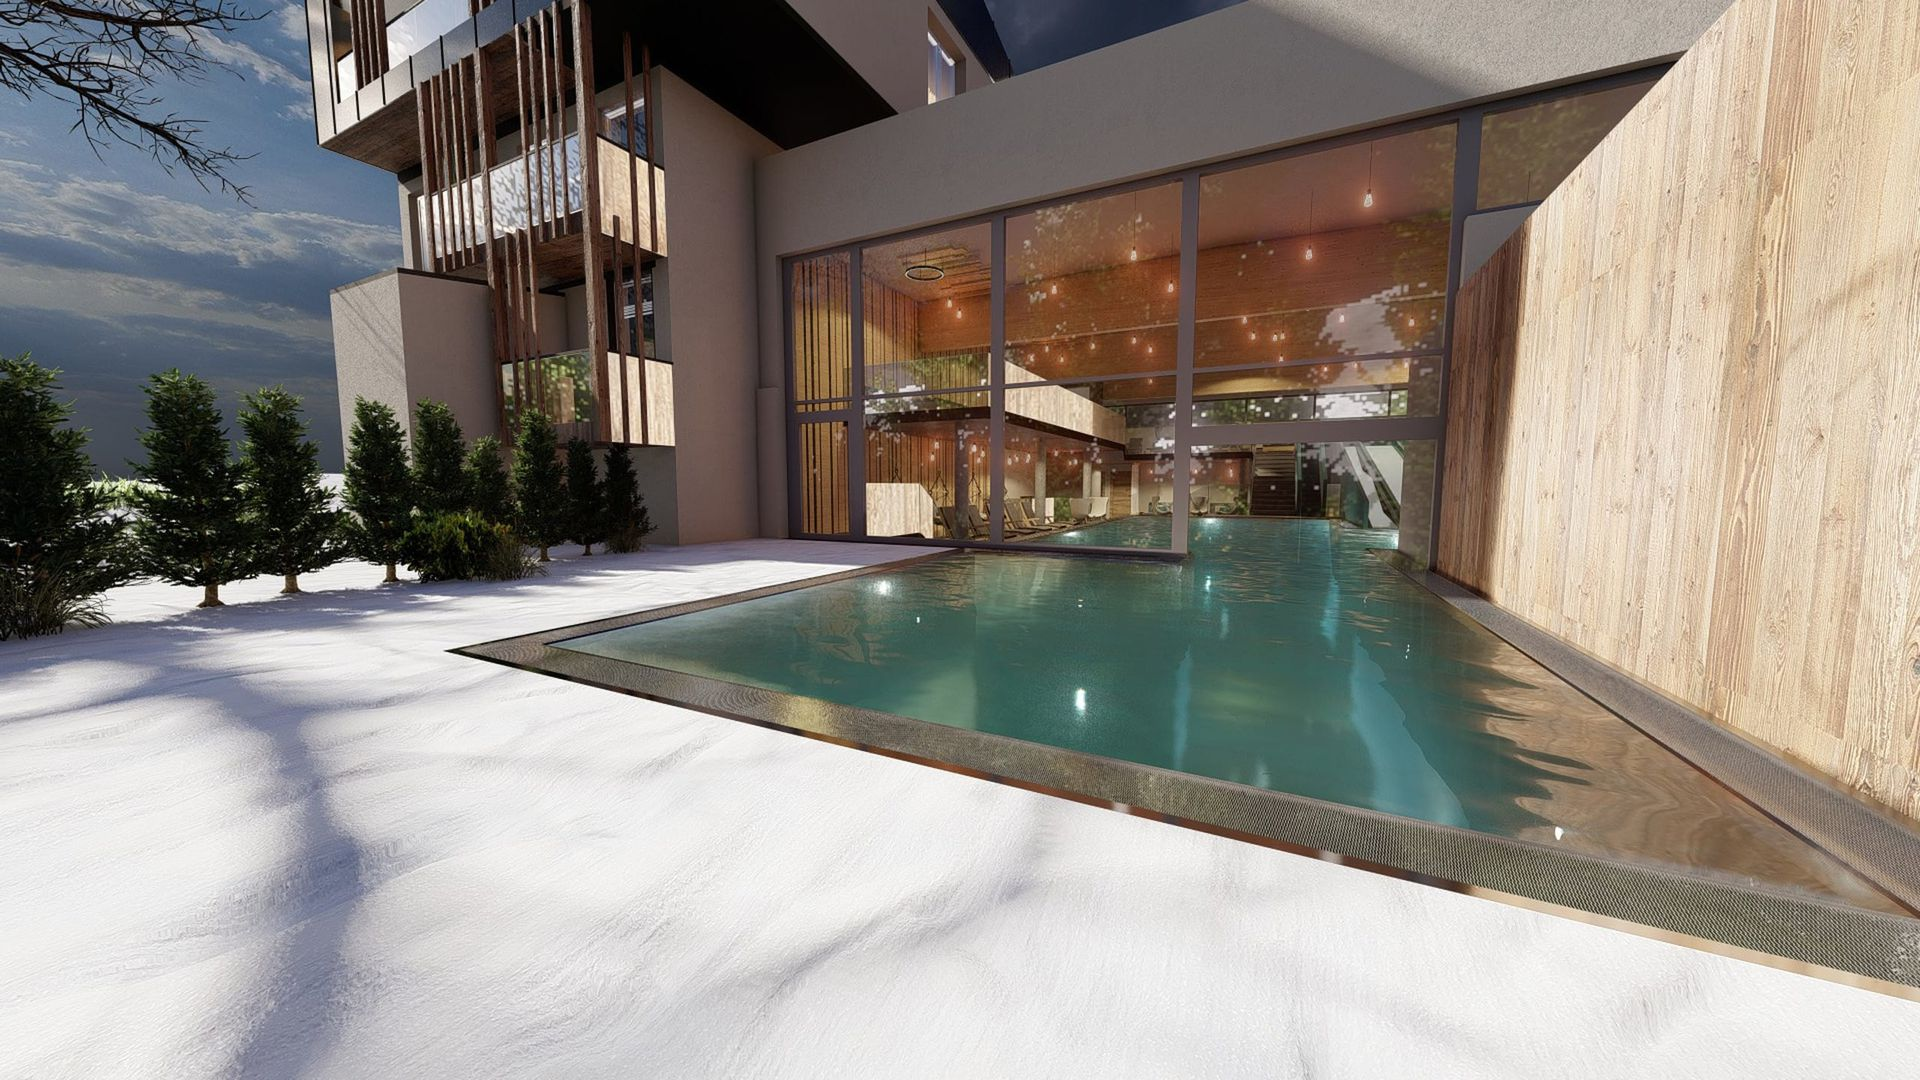 Wagrain - Hofgut Wagrain Apartment & Lifestyle Resort